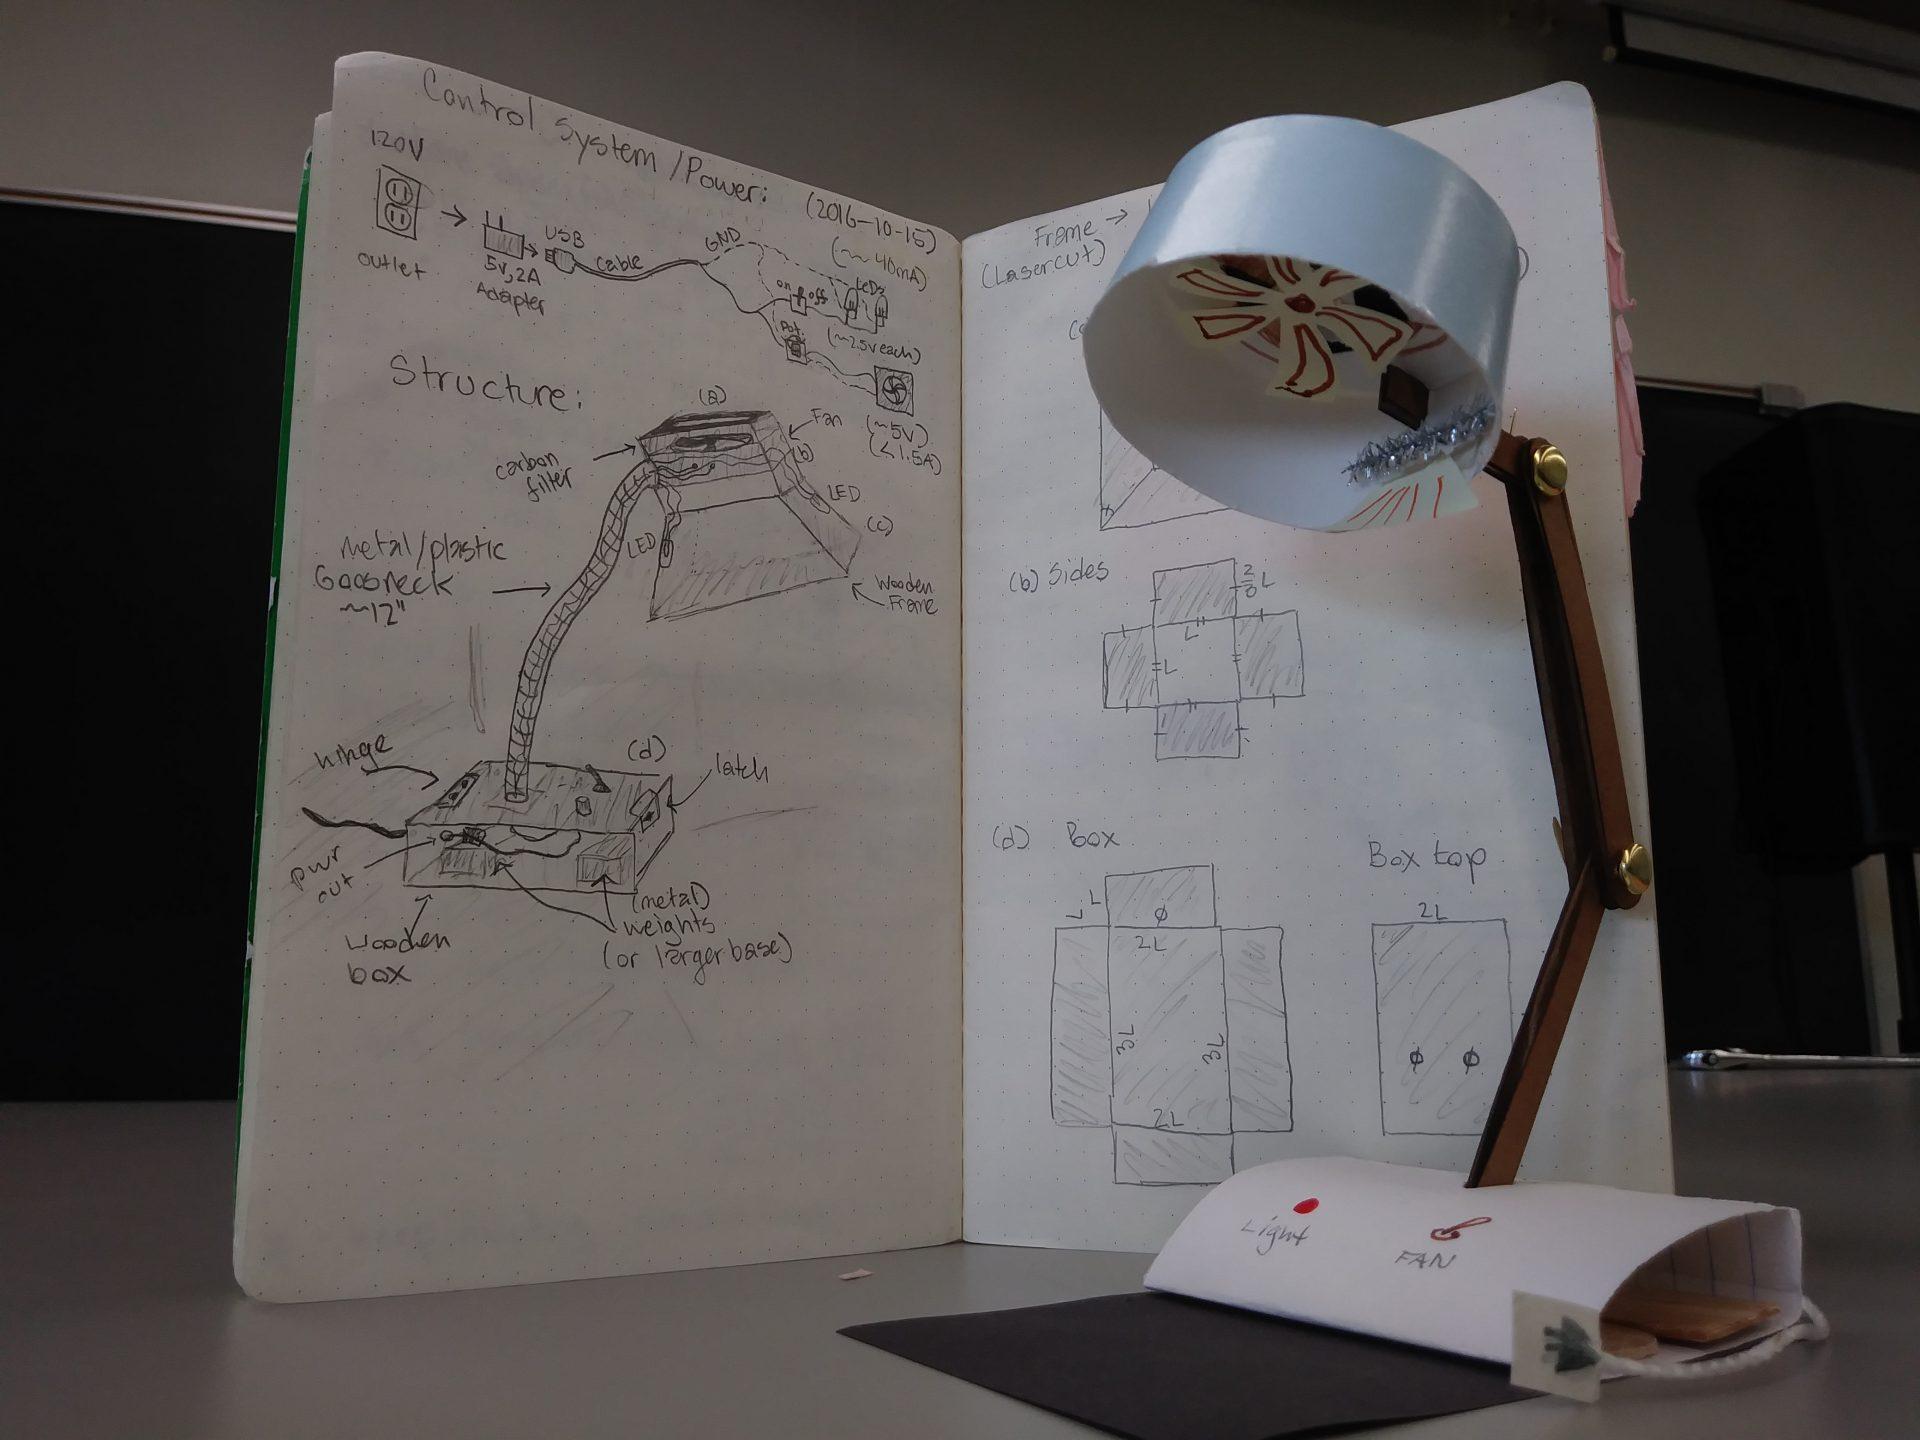 Paper Mock Up & Design Sketch of Fume Extractor